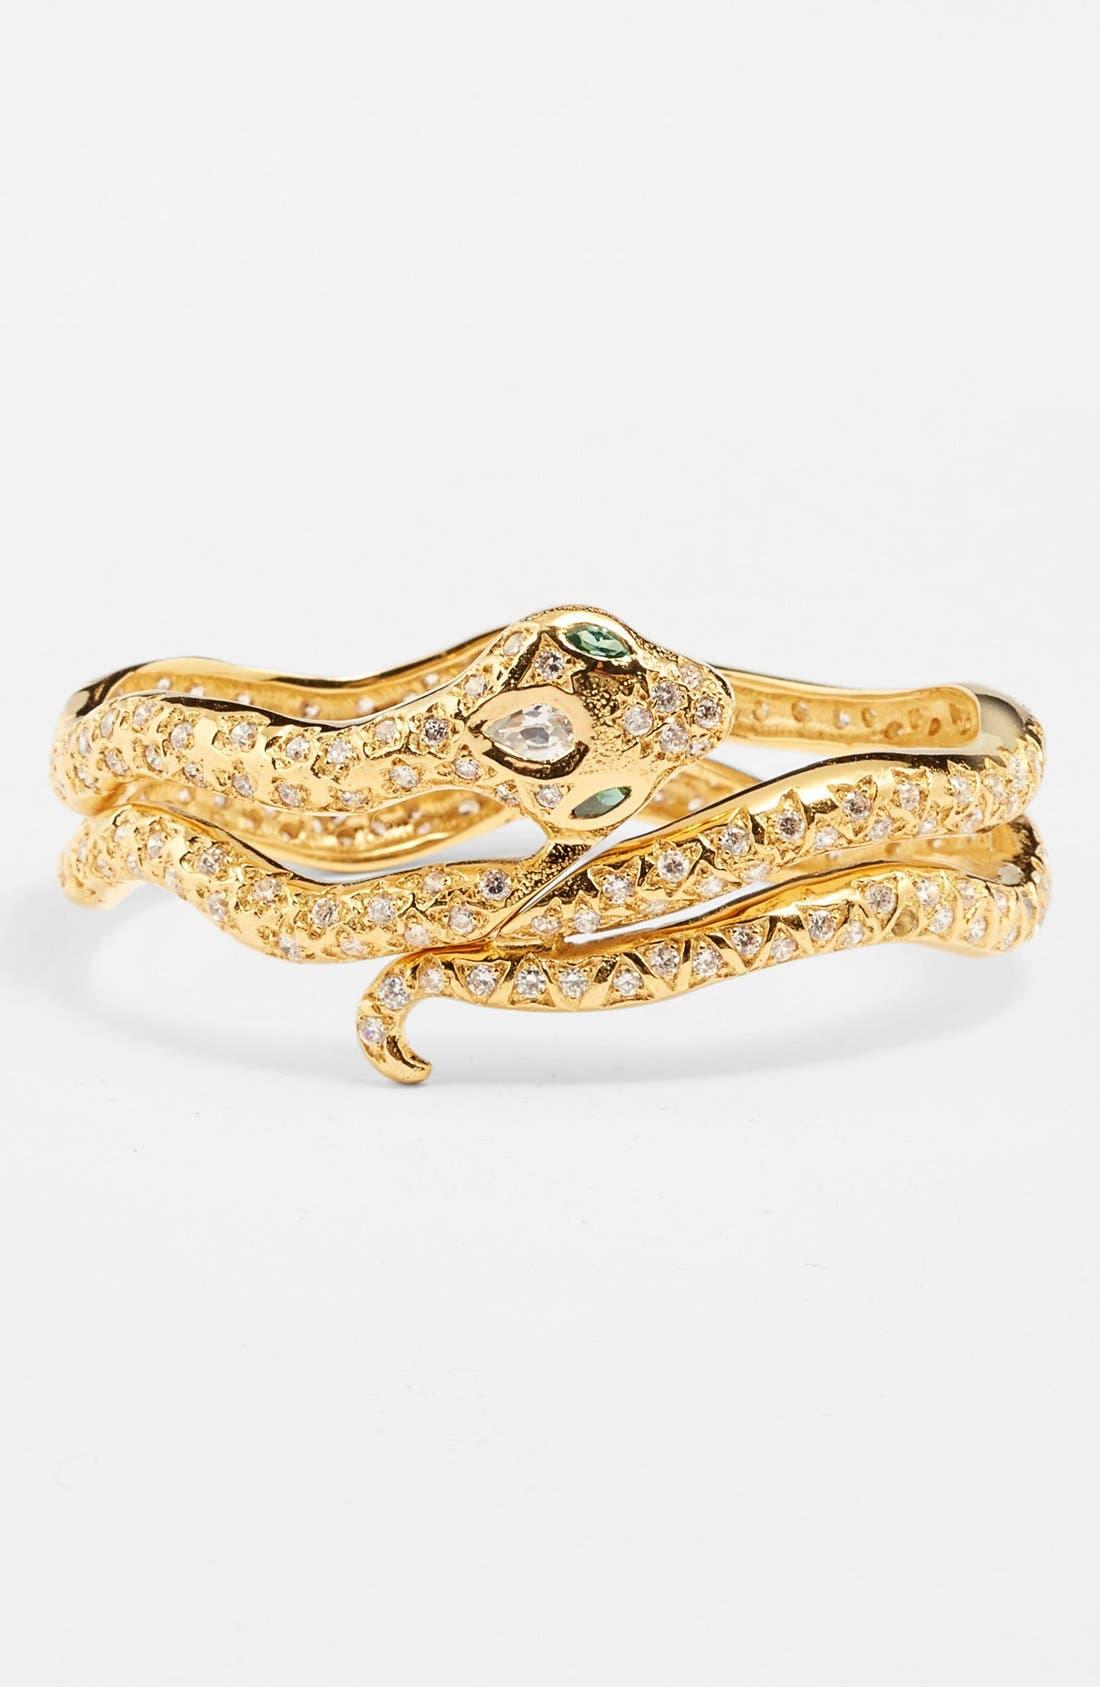 Alternate Image 1 Selected - Melinda Maria 'Serpent' Hinged Bracelet (Online Only)